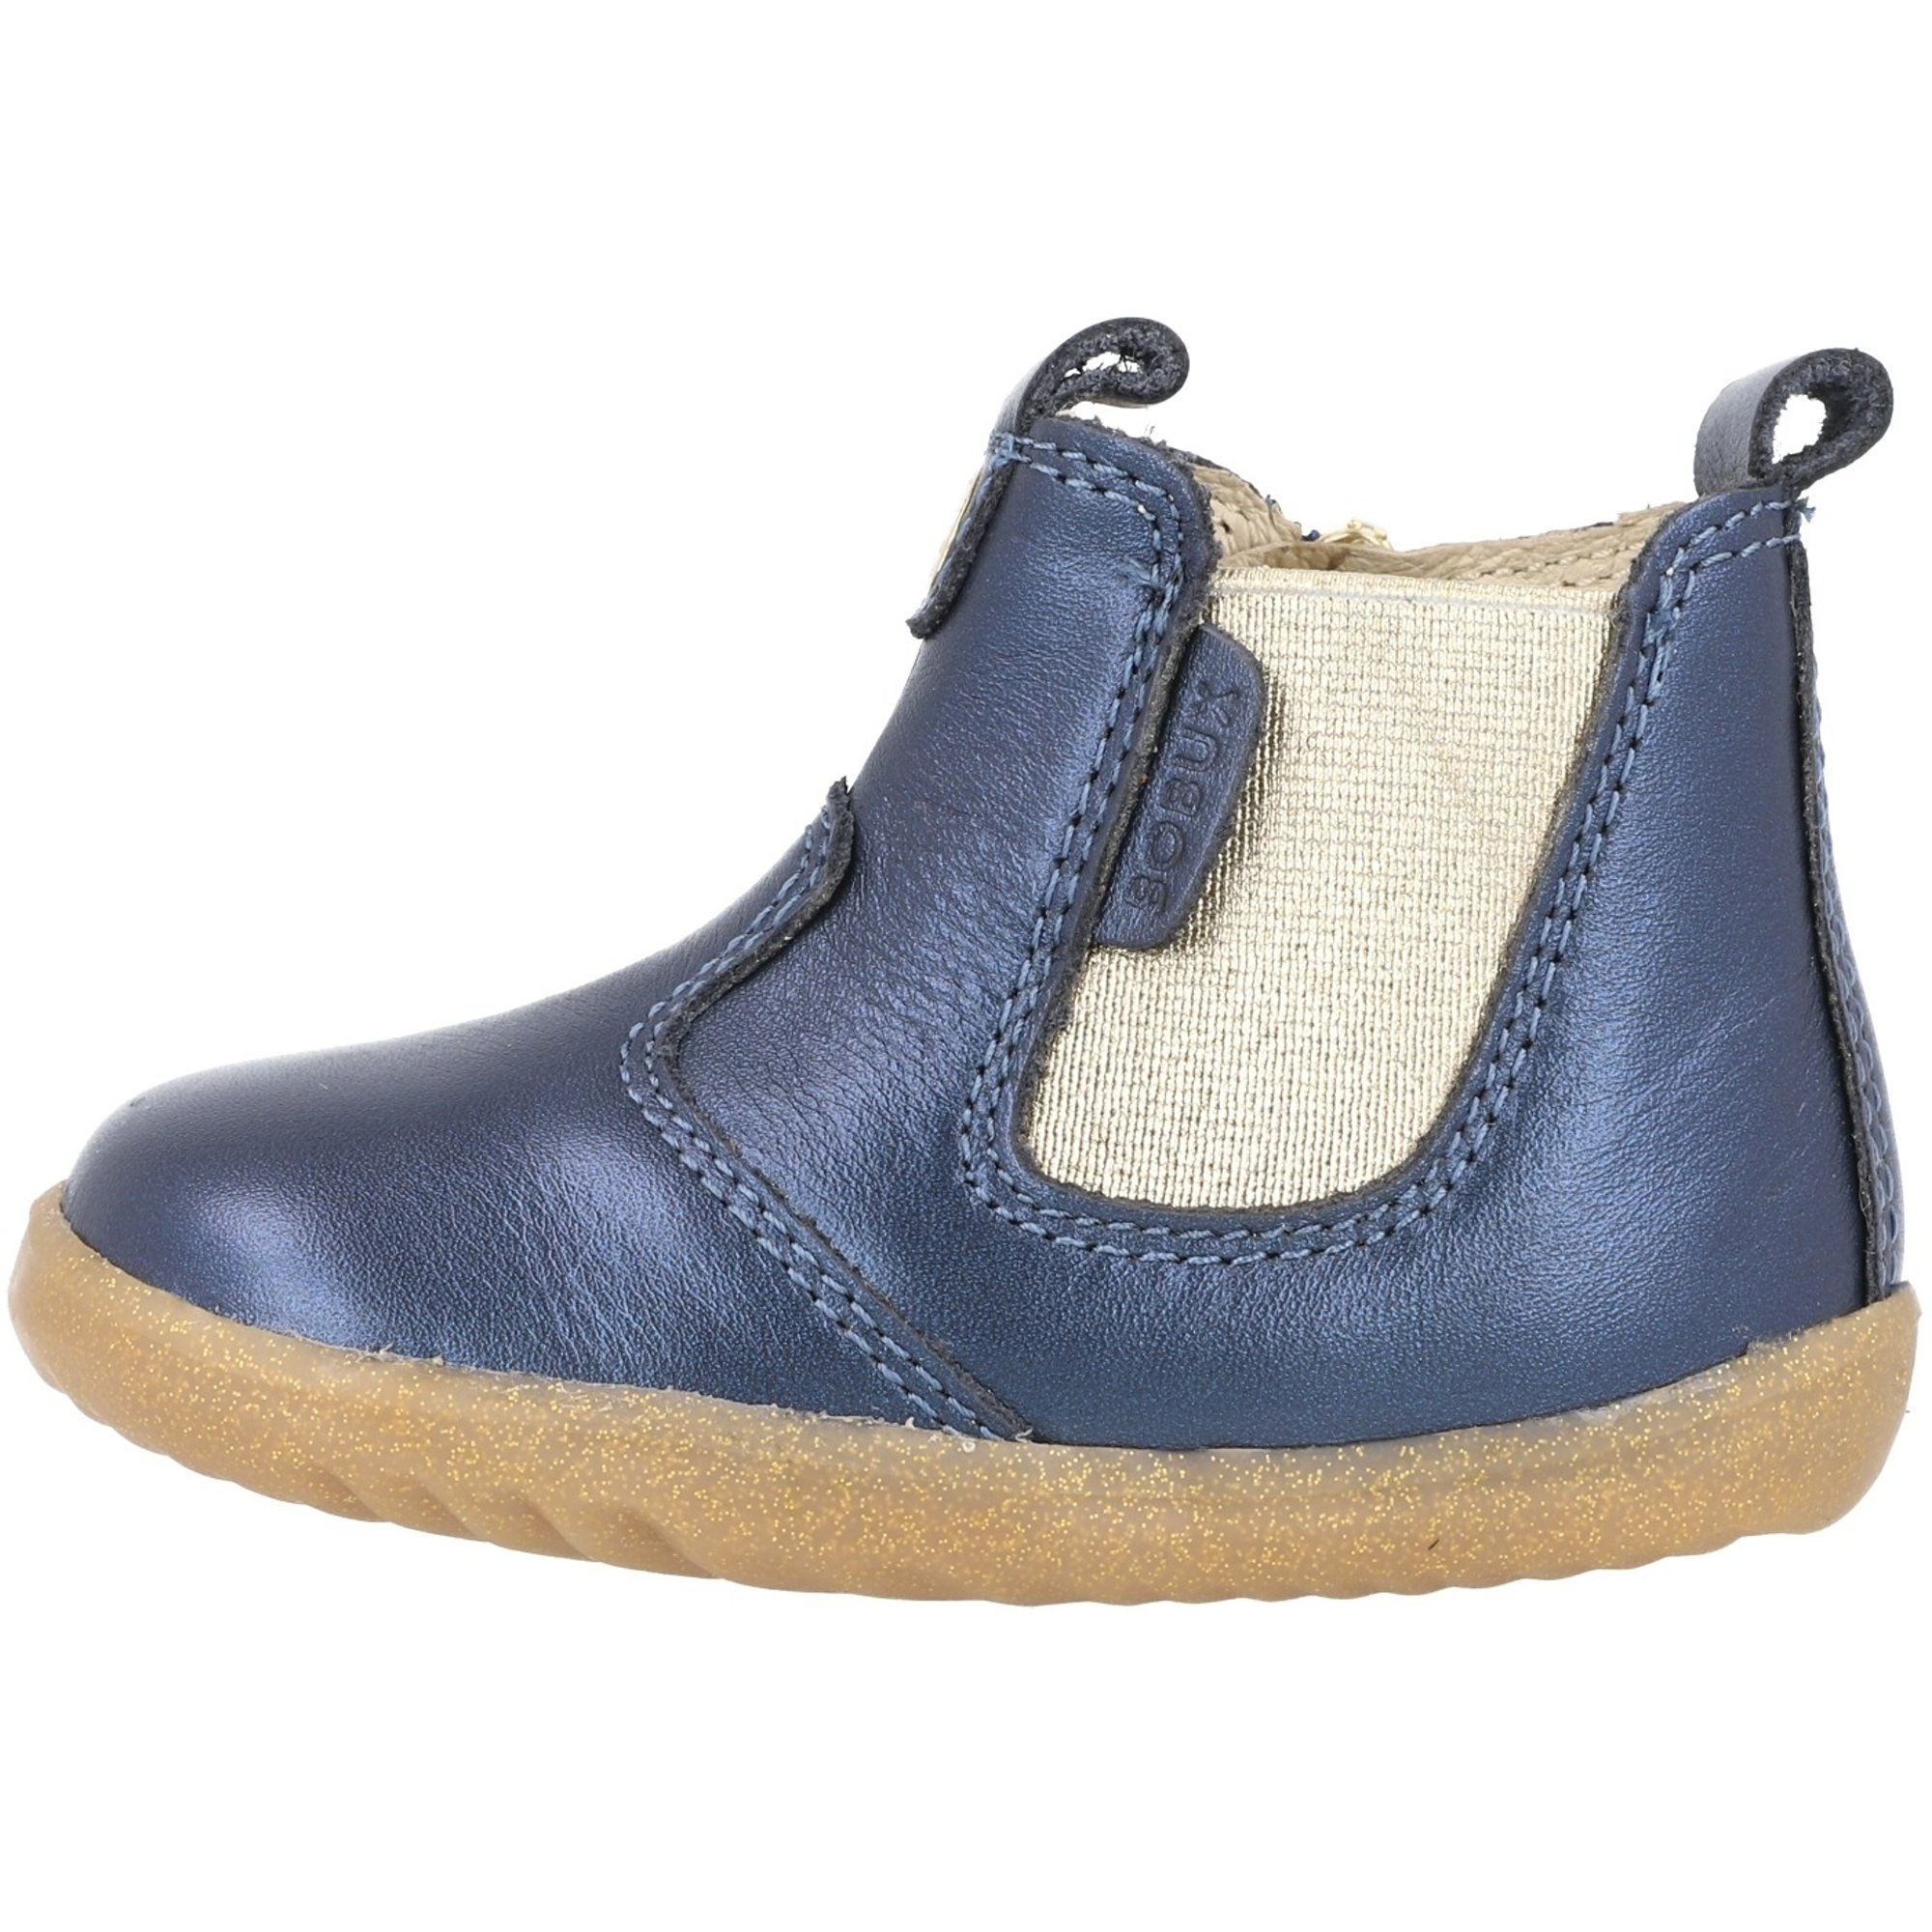 Bobux Step Up Jodhpur Navy Shimmer Shimmer Leather